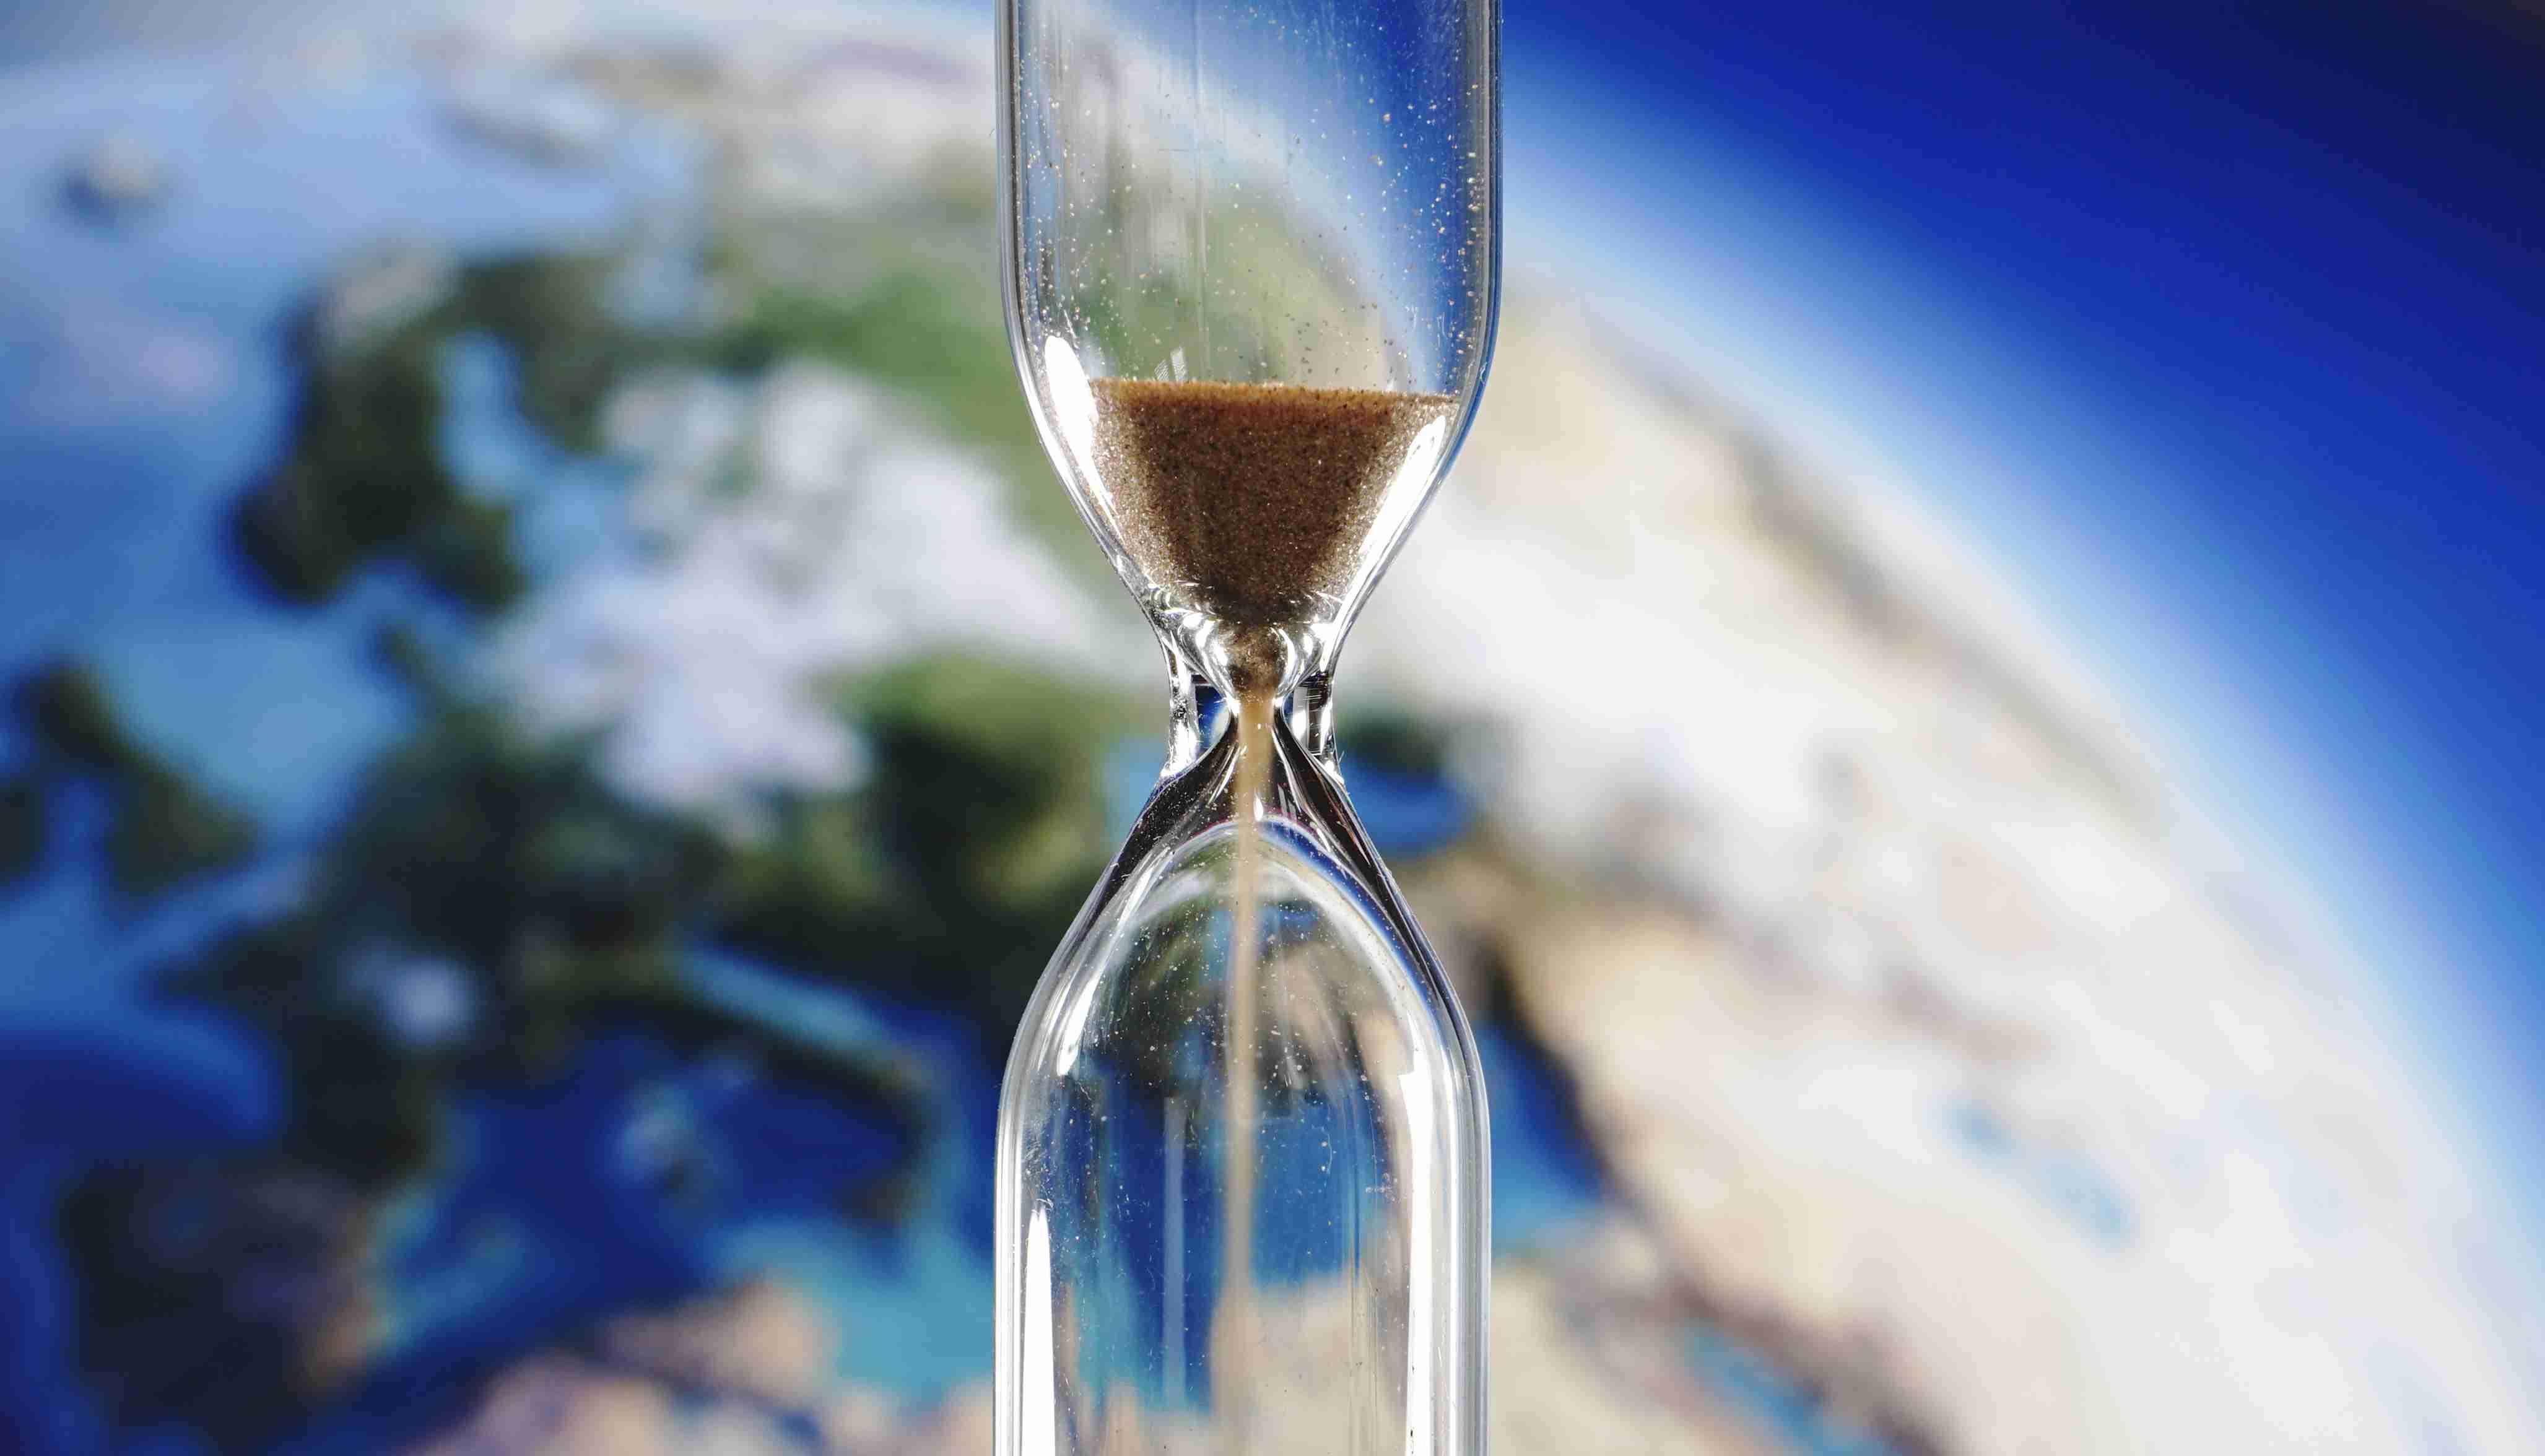 Earth and hourglass